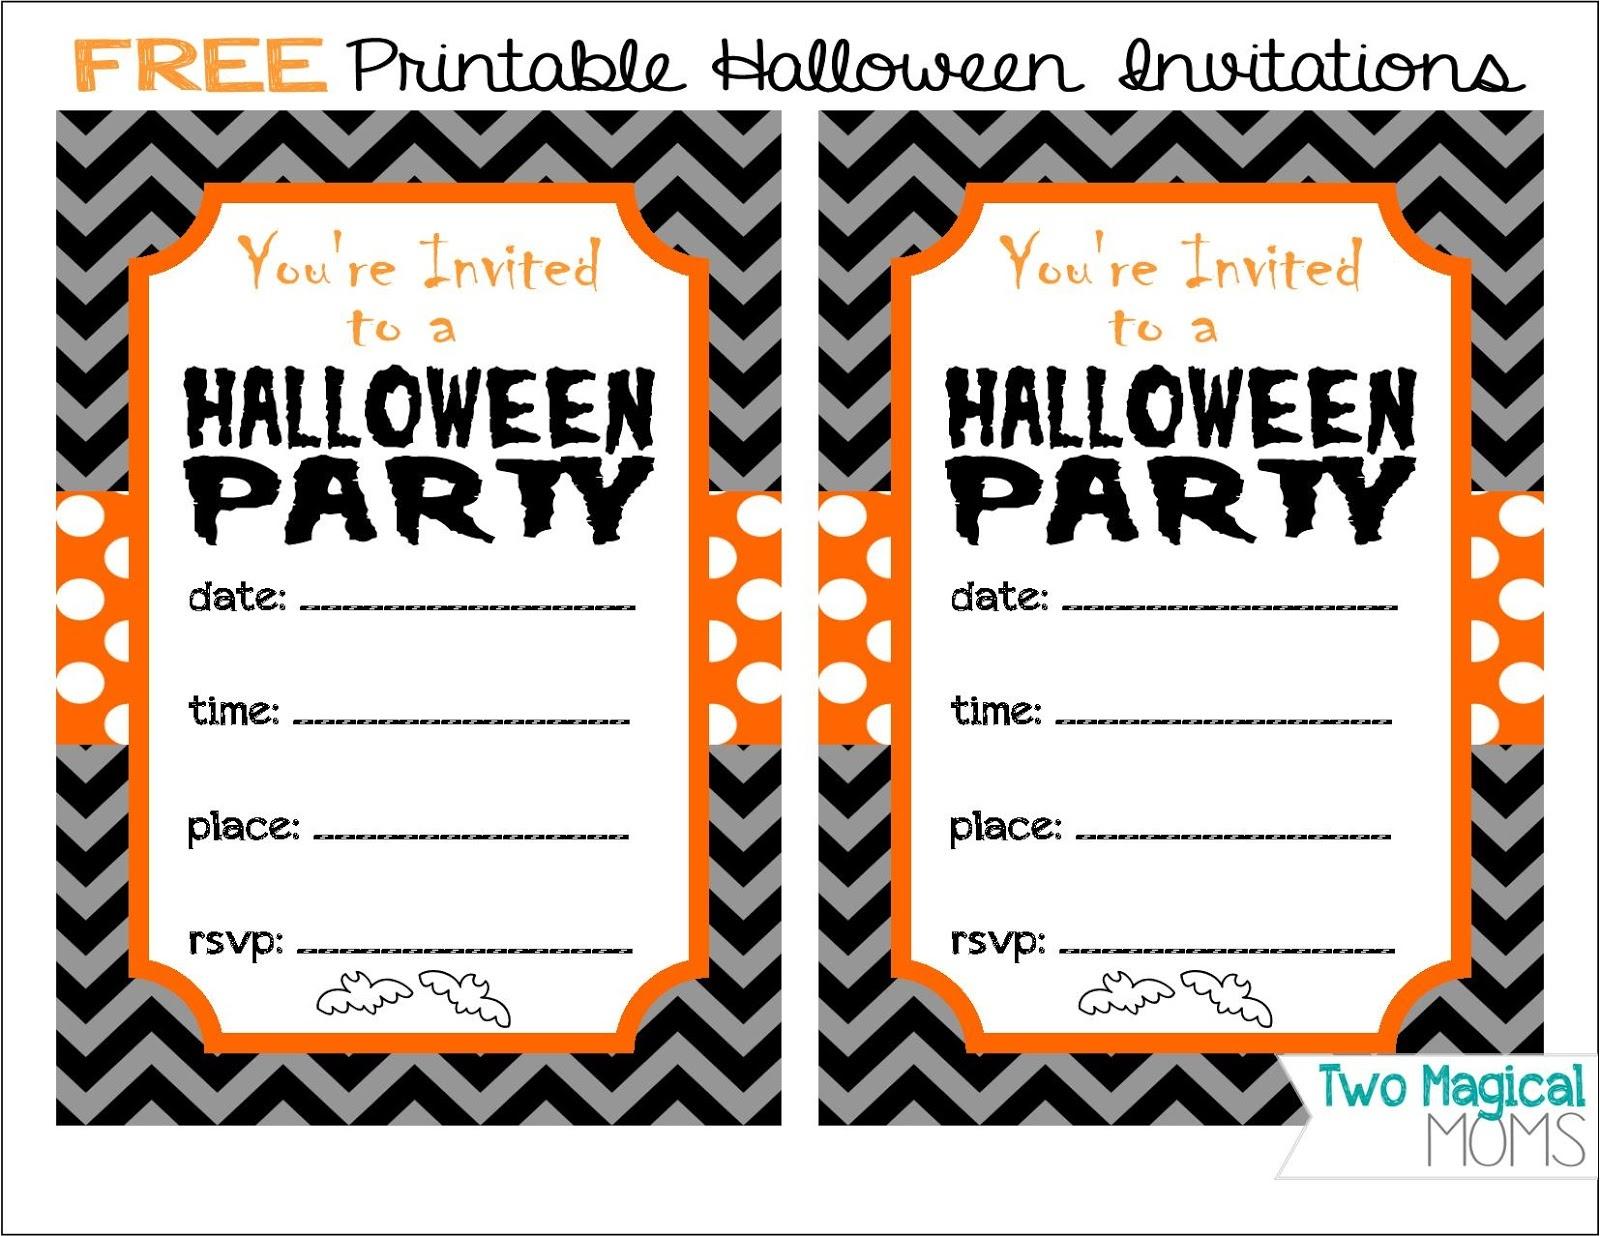 Two Magical Moms: Free Printable Halloween Invitations - Free Printable Halloween Invitations